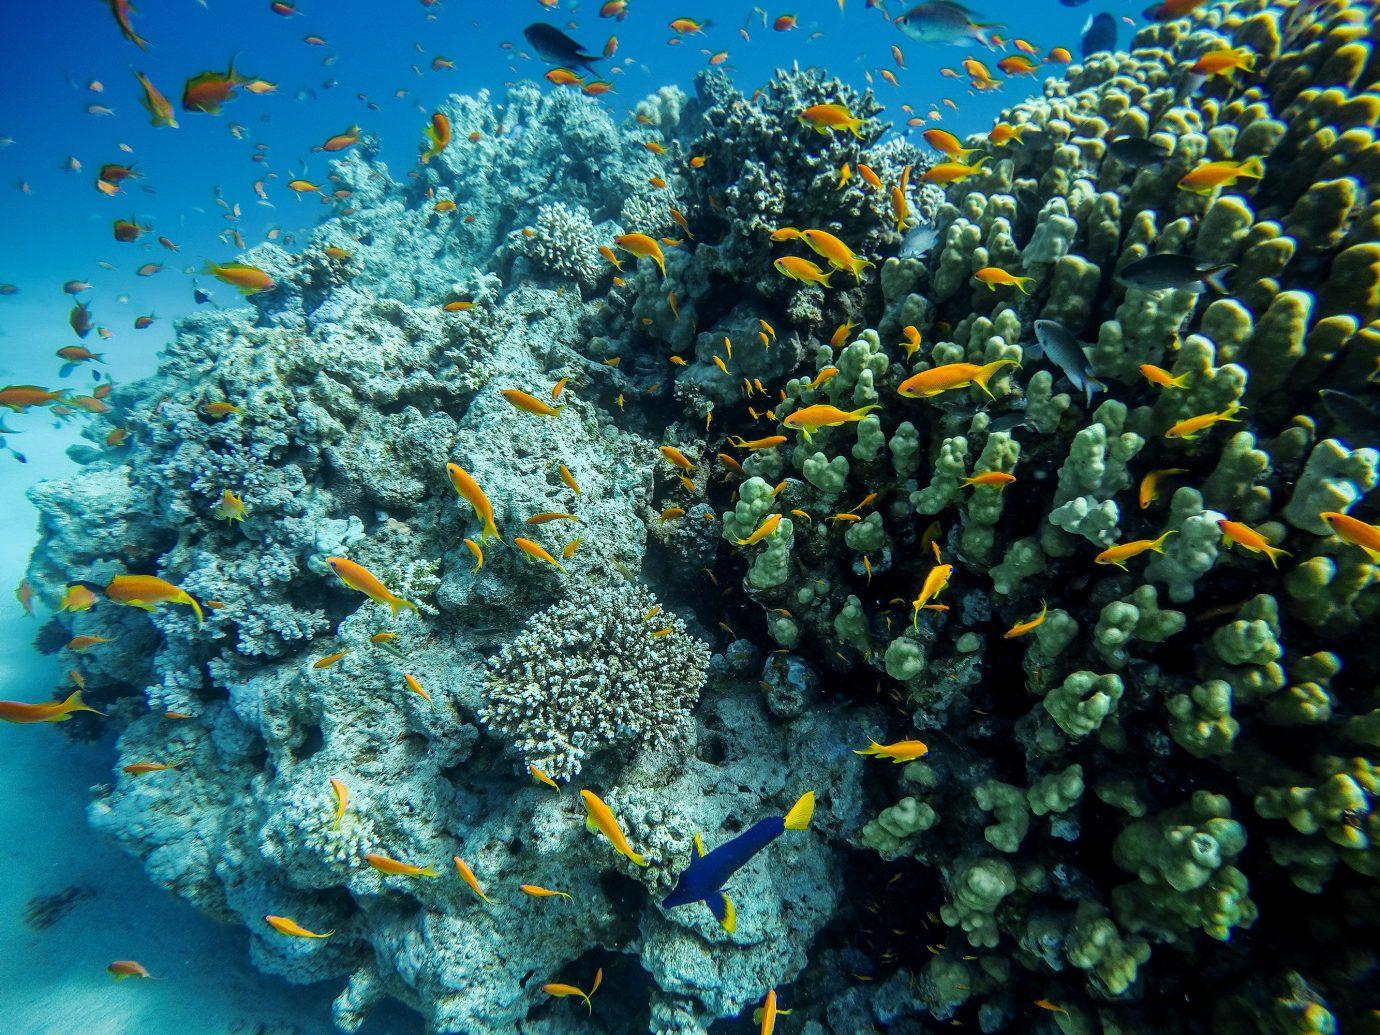 Trip Ideas coral reef marine biology reef coral ecosystem organism Nature underwater coral reef fish stony coral ocean floor